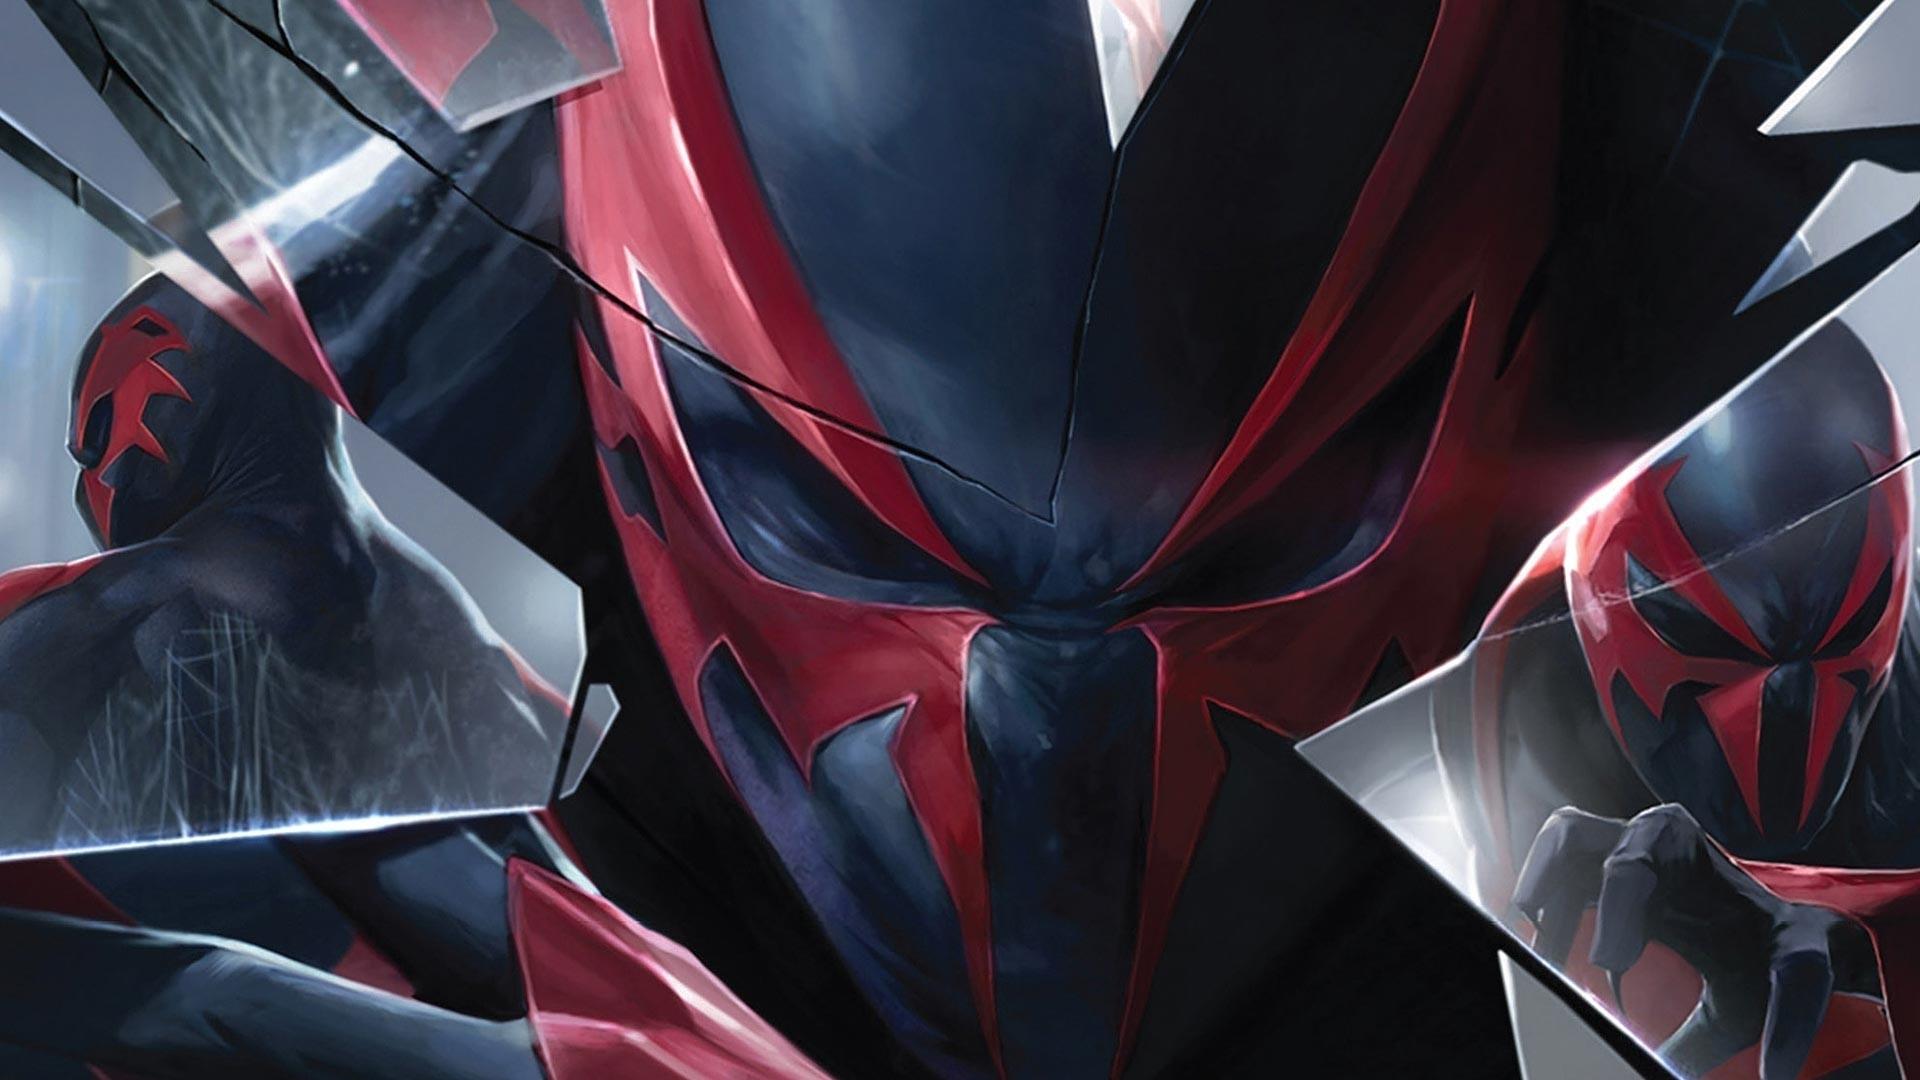 spider man 2099 wallpaper (78+ images)